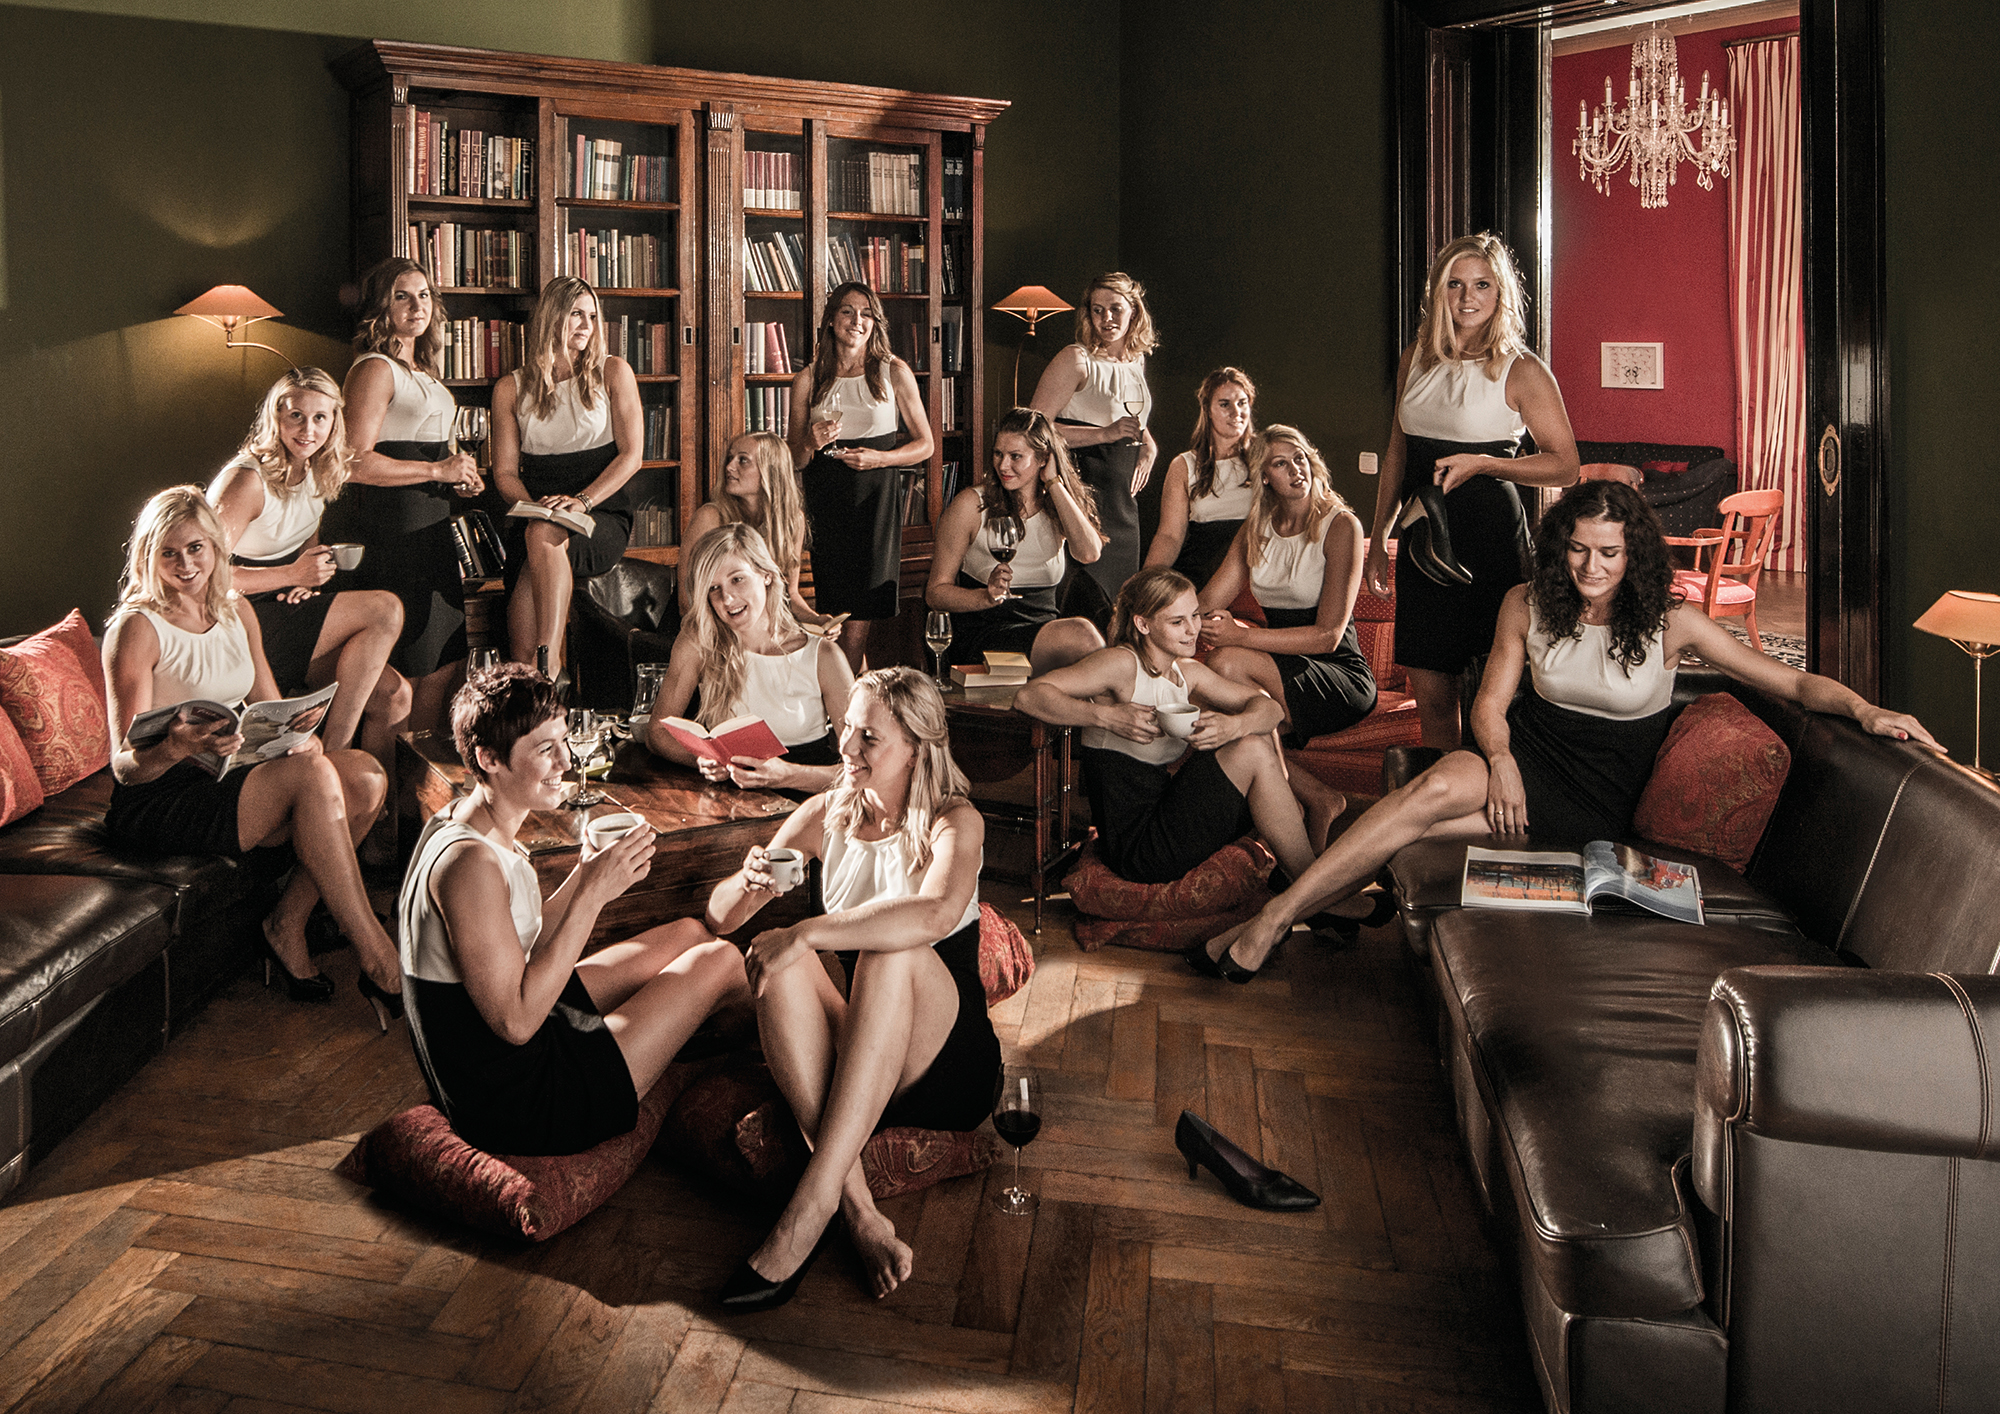 Handball Damen vom HCL im Club International - fotografiert für HCL Kampagne  - © Dirk Brzoska